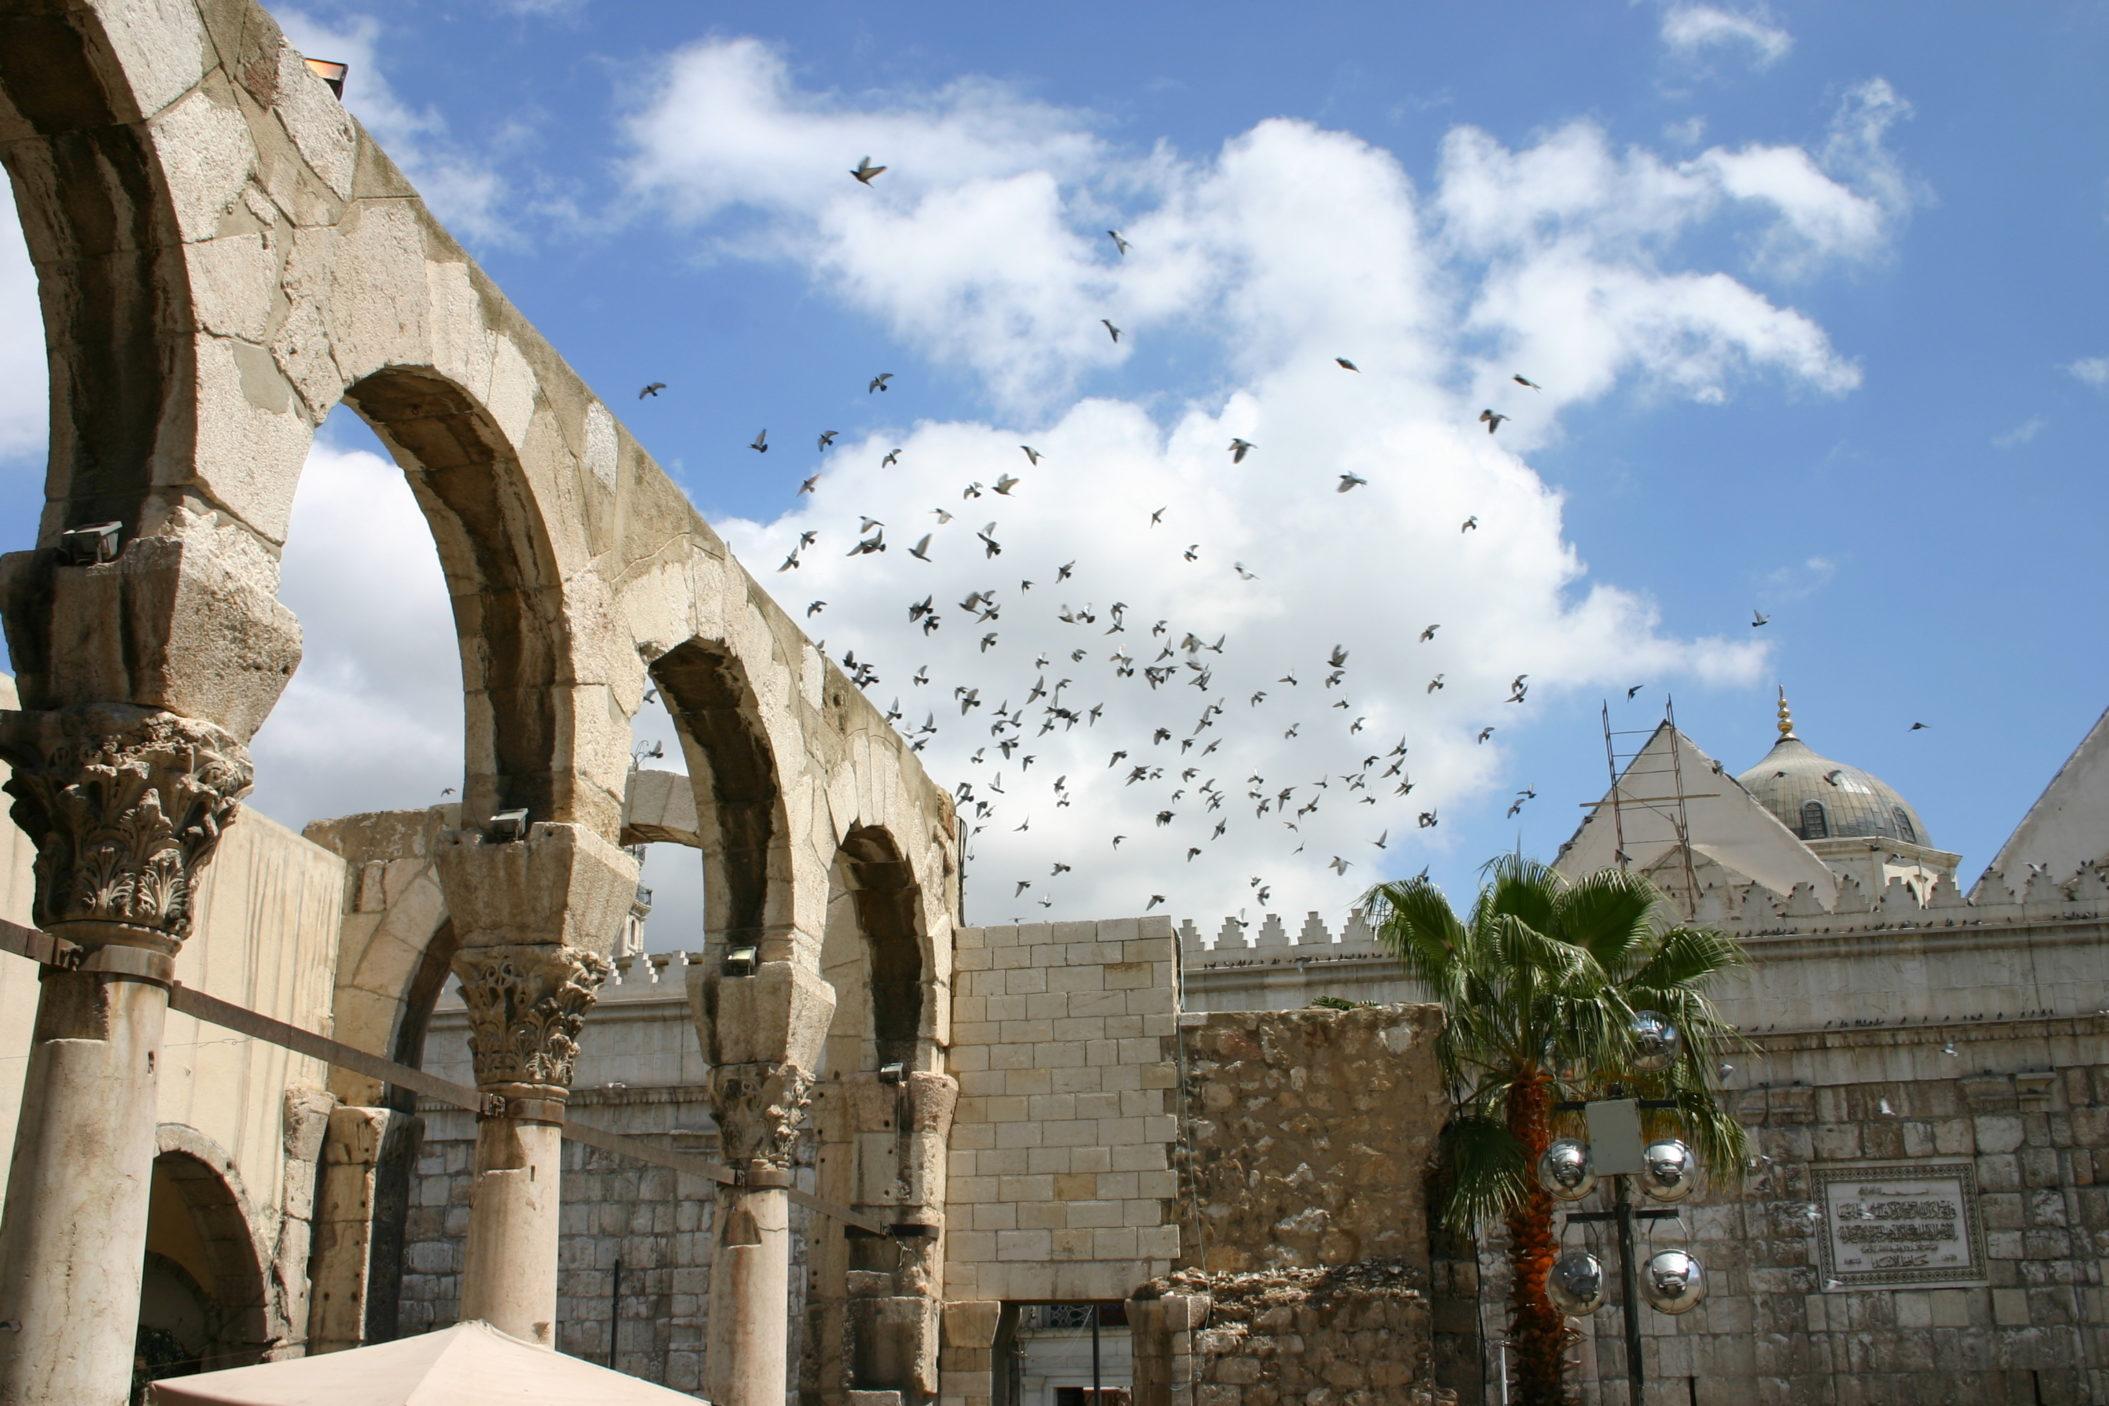 Syria [Shutterstock]